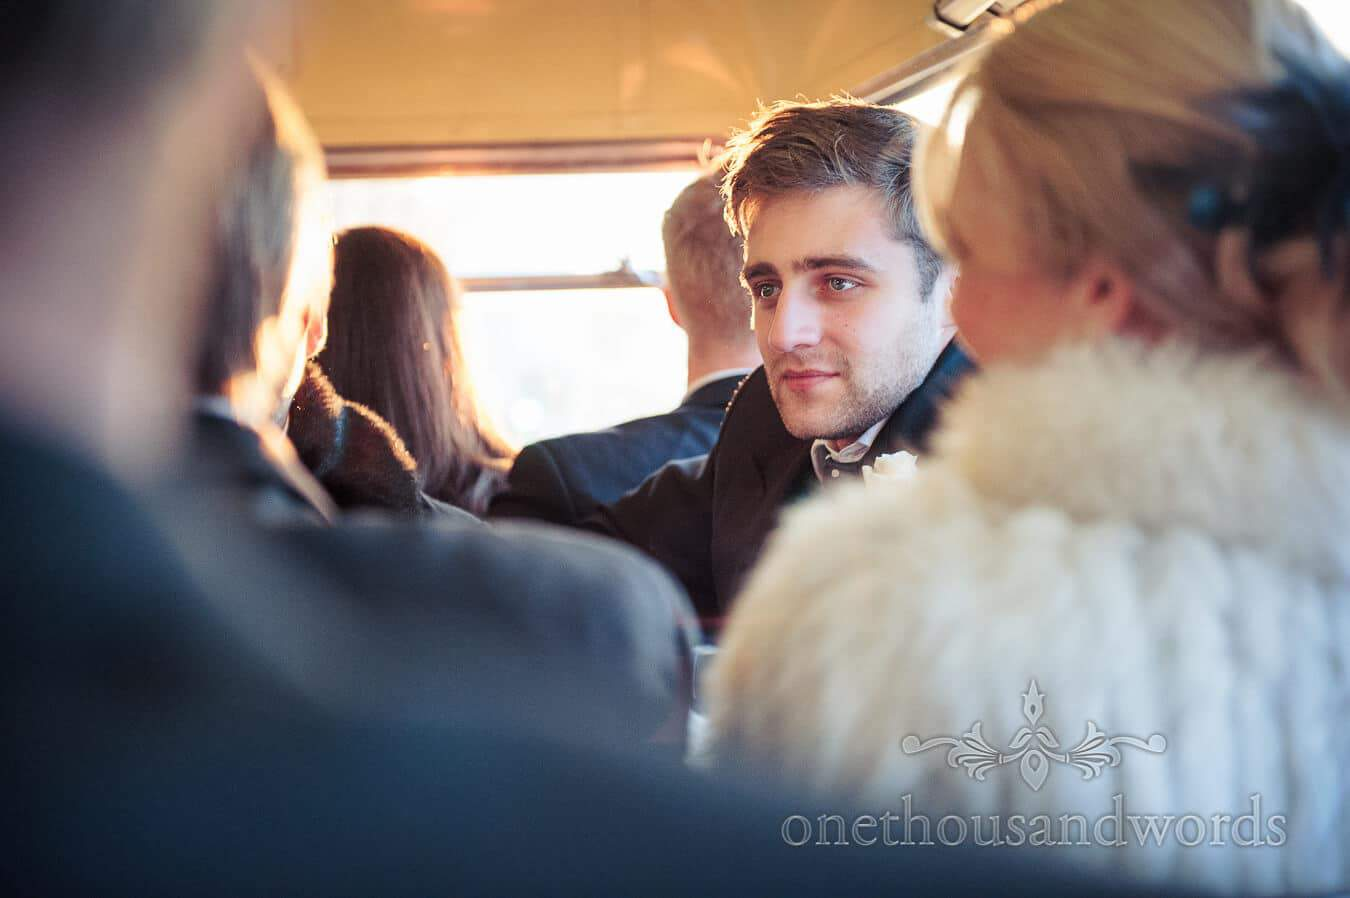 Wedding guest portrait on red London bus wedding transport